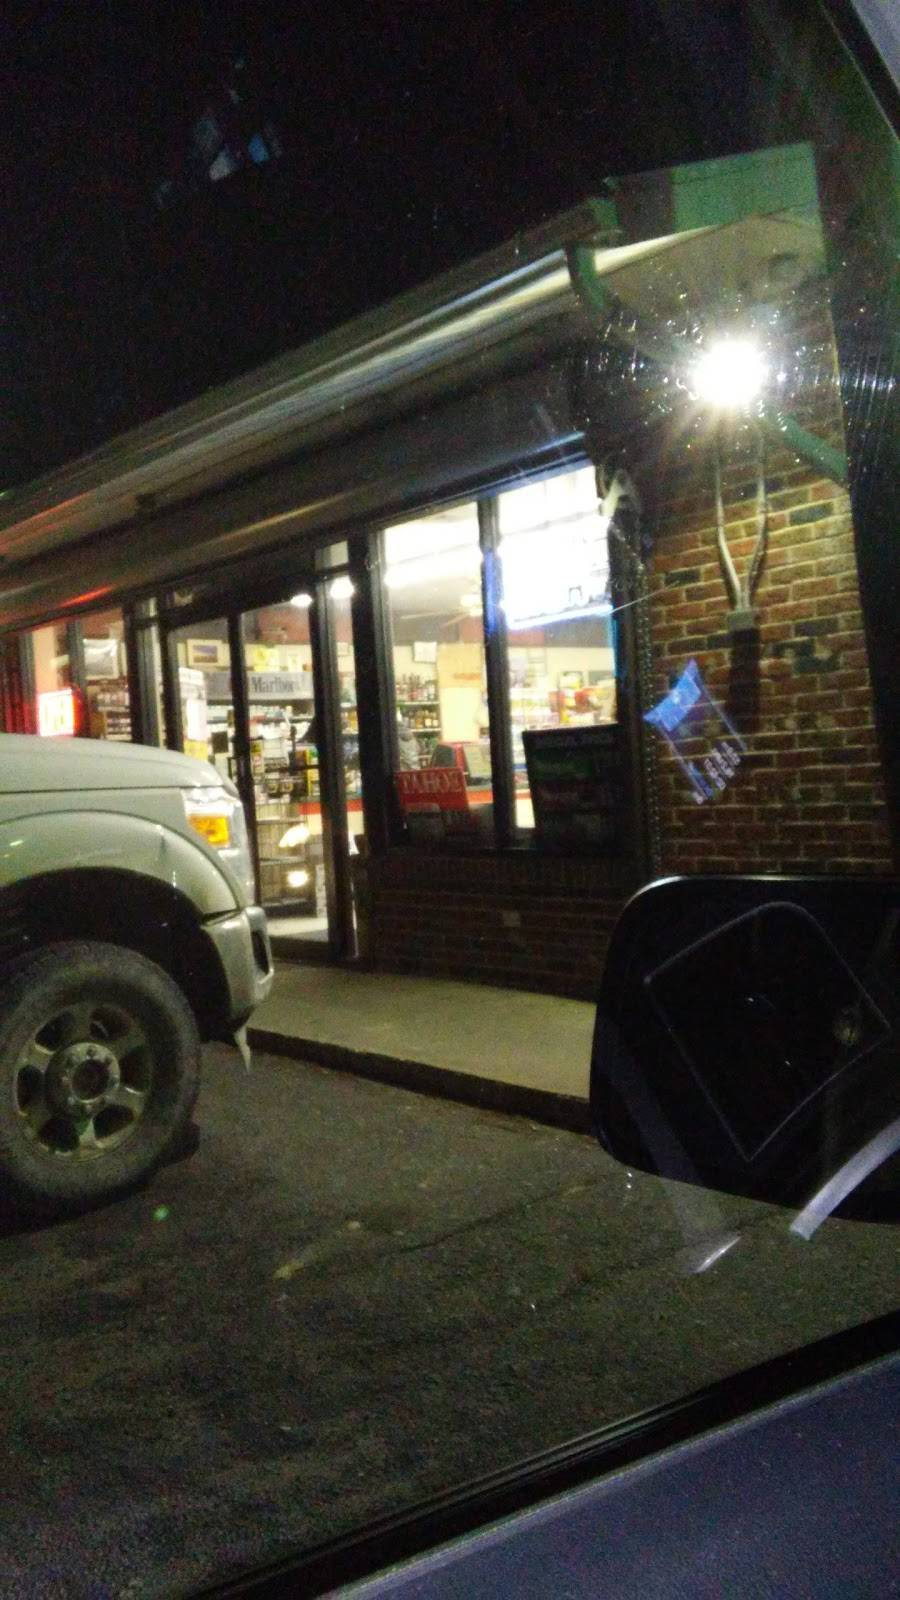 U5 Foods | restaurant | 3850 Smithville Rd, Federalsburg, MD 21632, USA | 4107548294 OR +1 410-754-8294